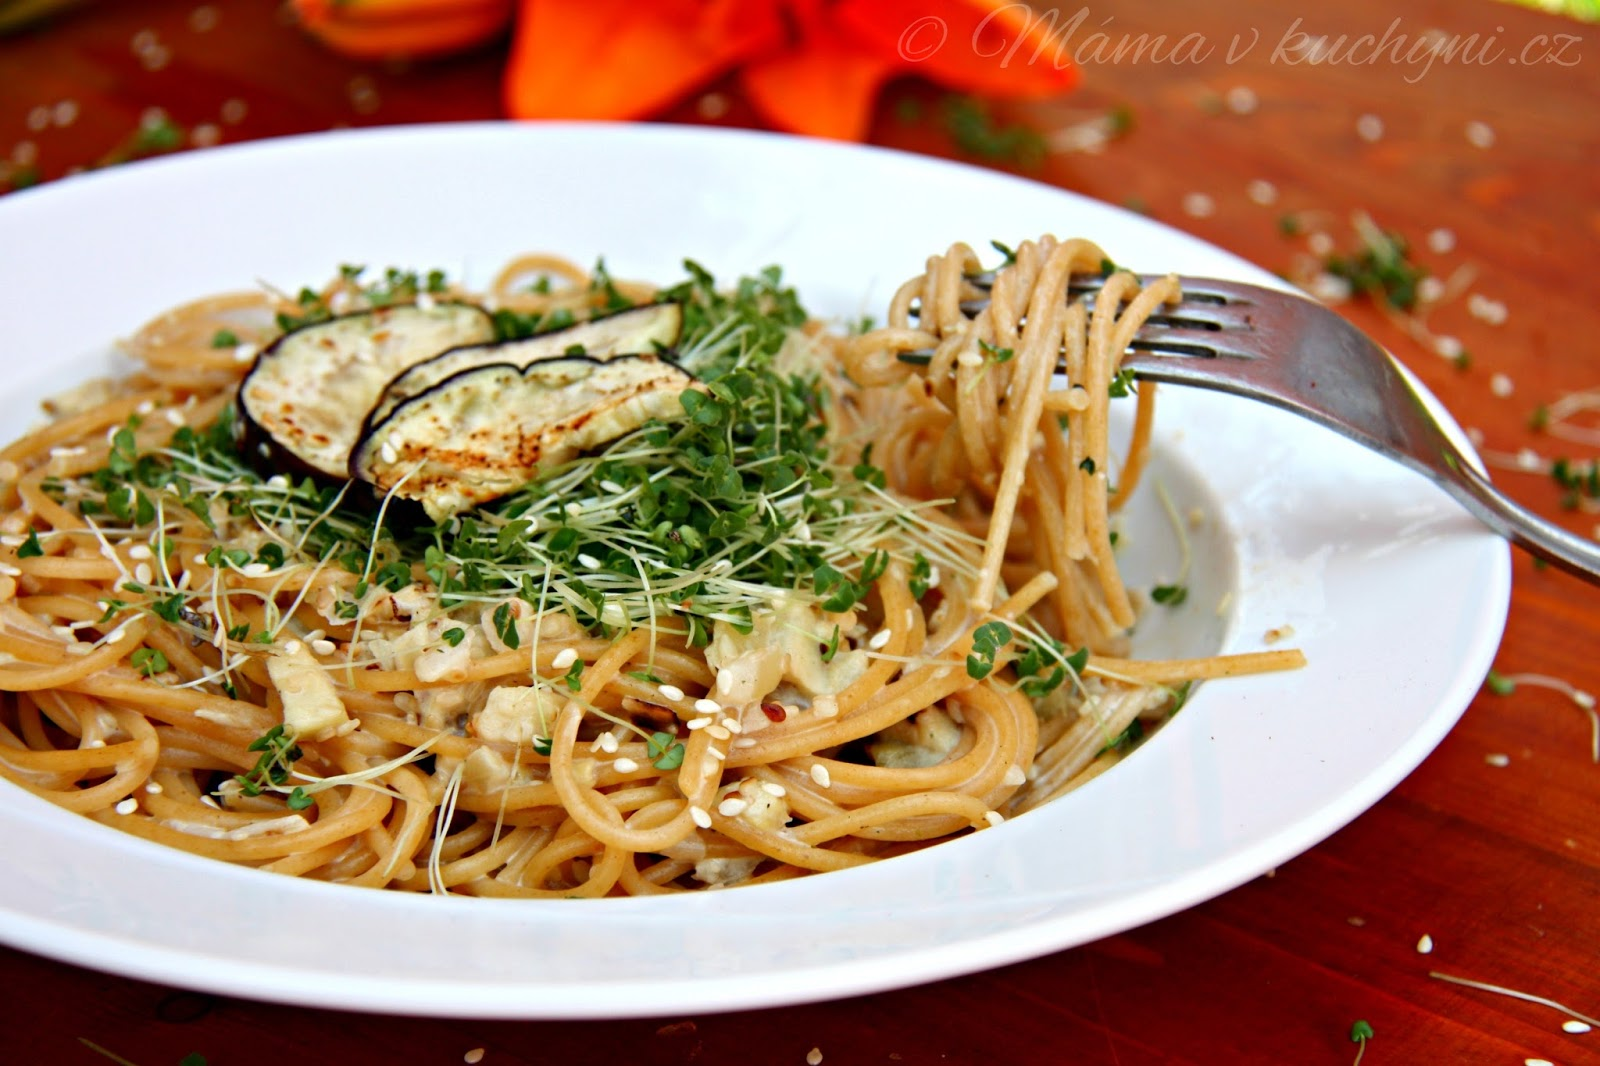 Špagety s lilkovou omáčkou a klíčenými chia semínky (od 1 roku)